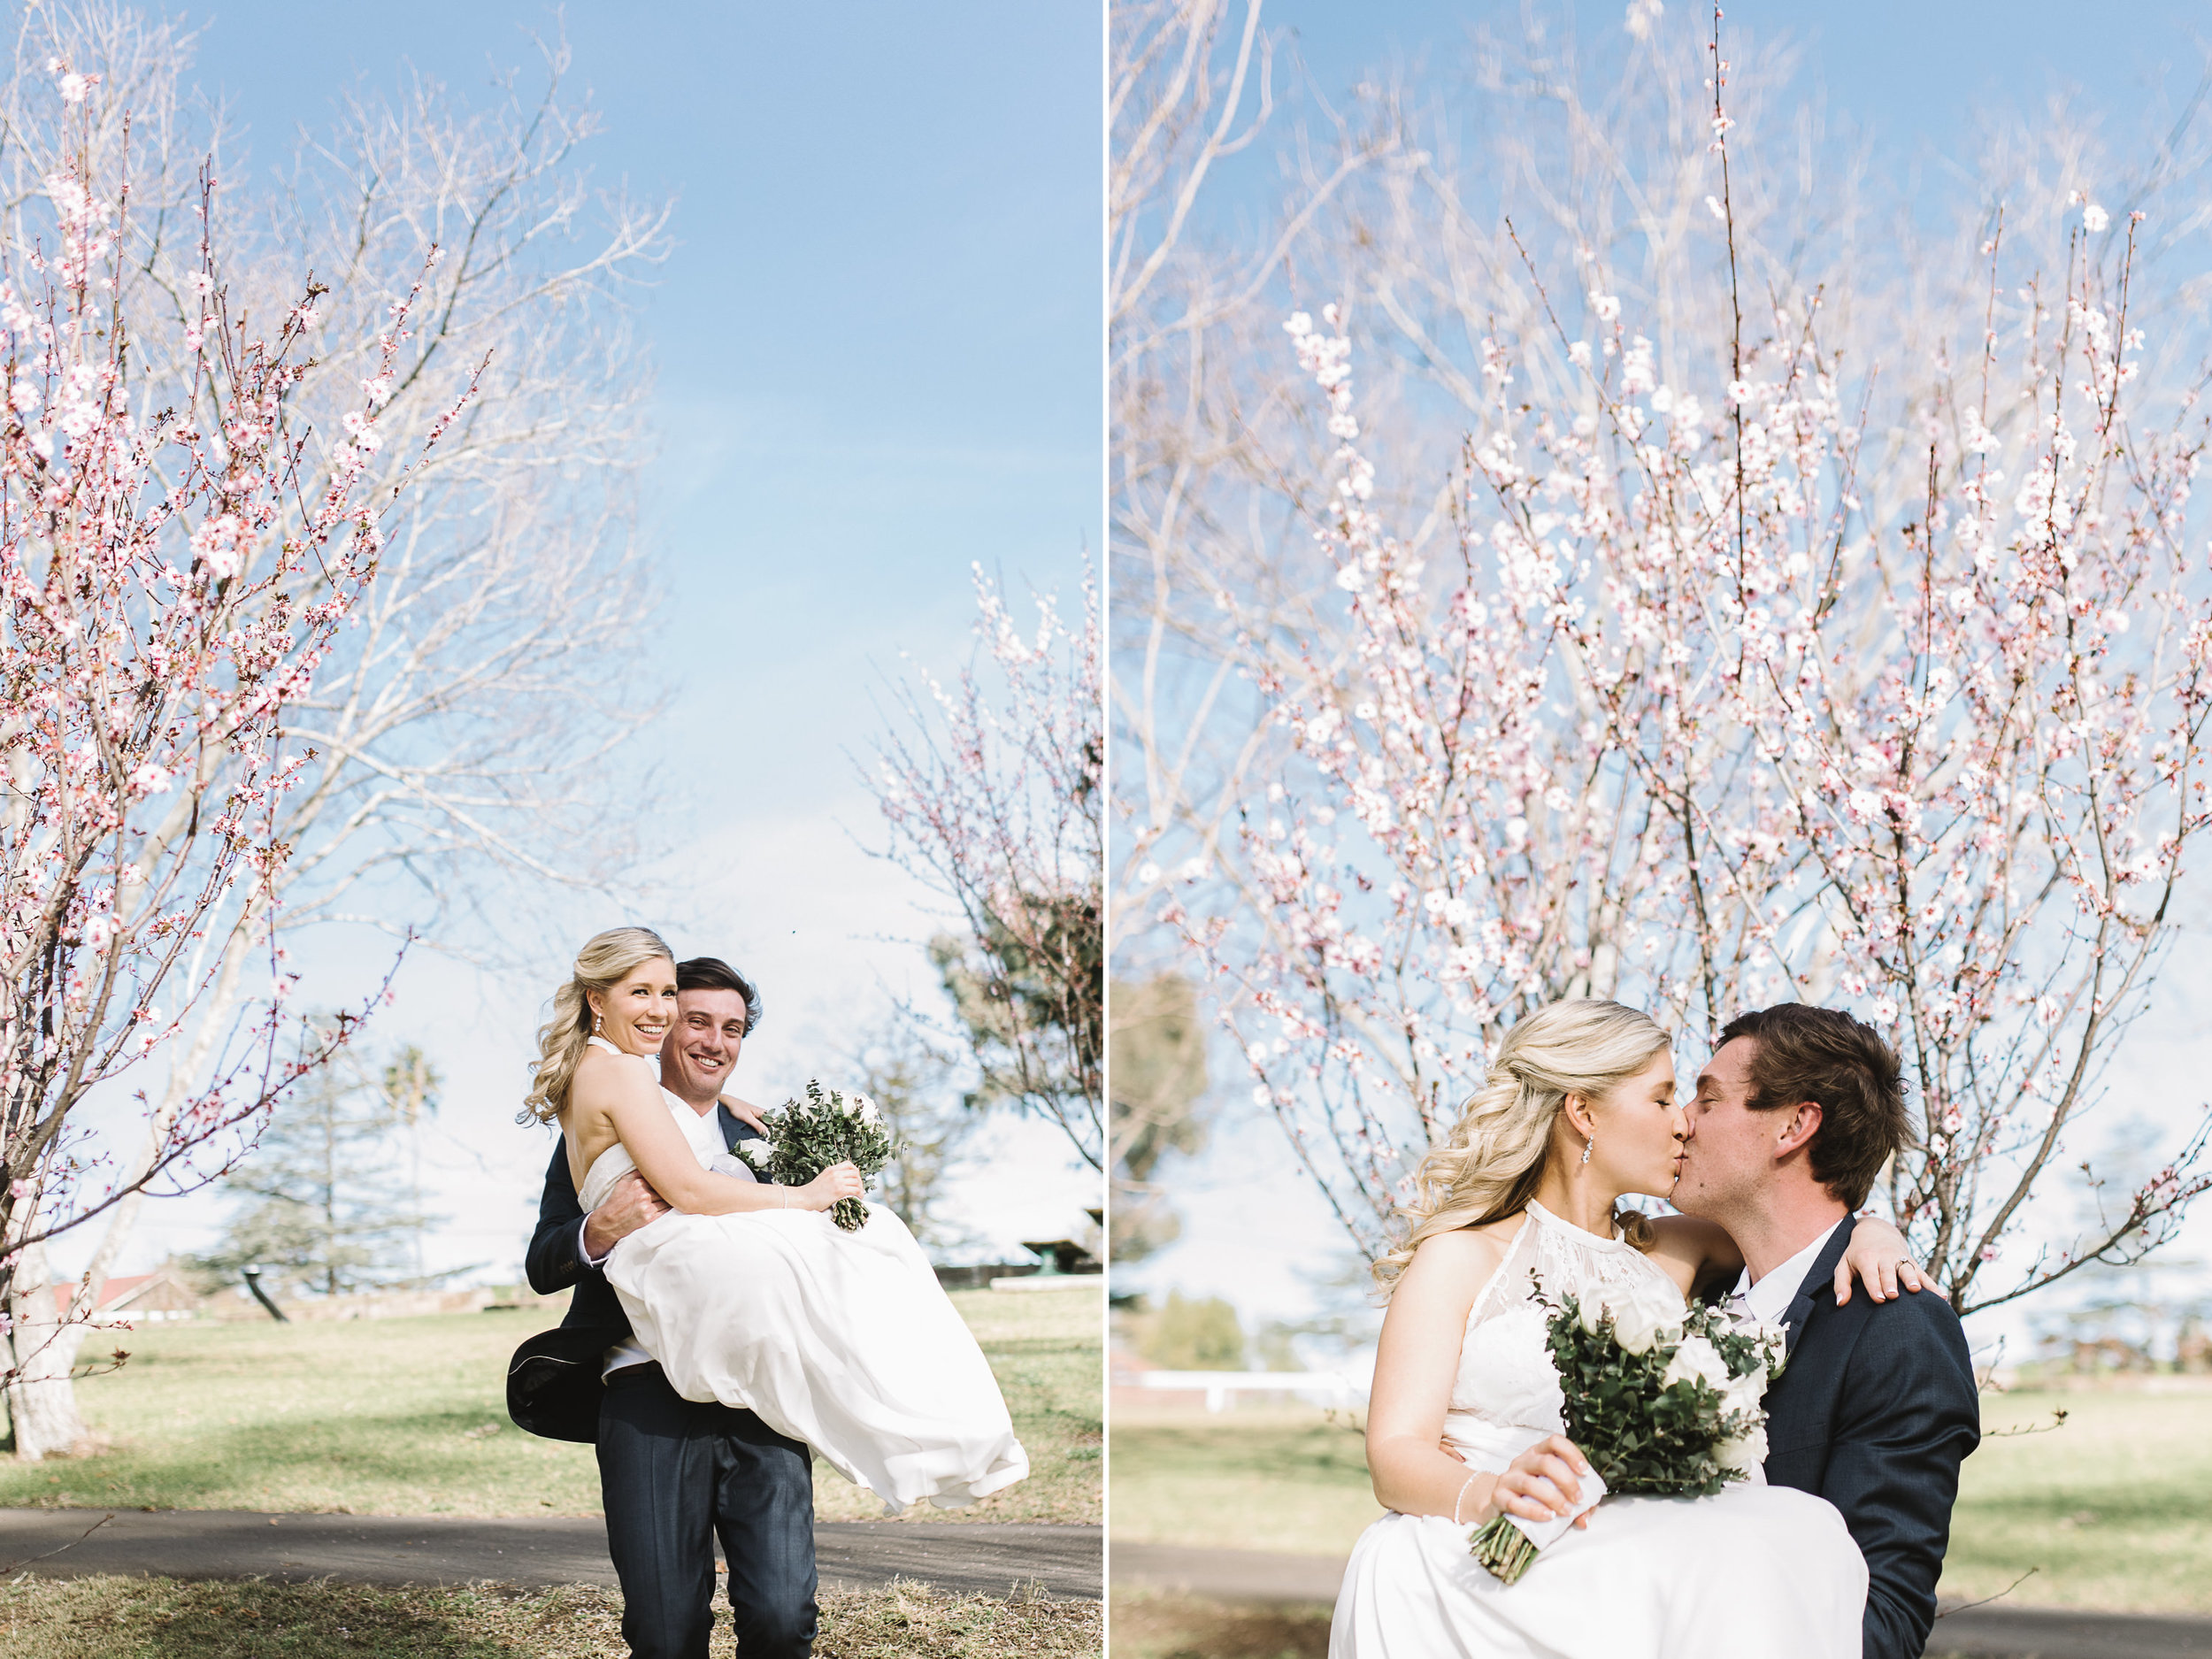 sydney-wedding-photographer-6.jpg